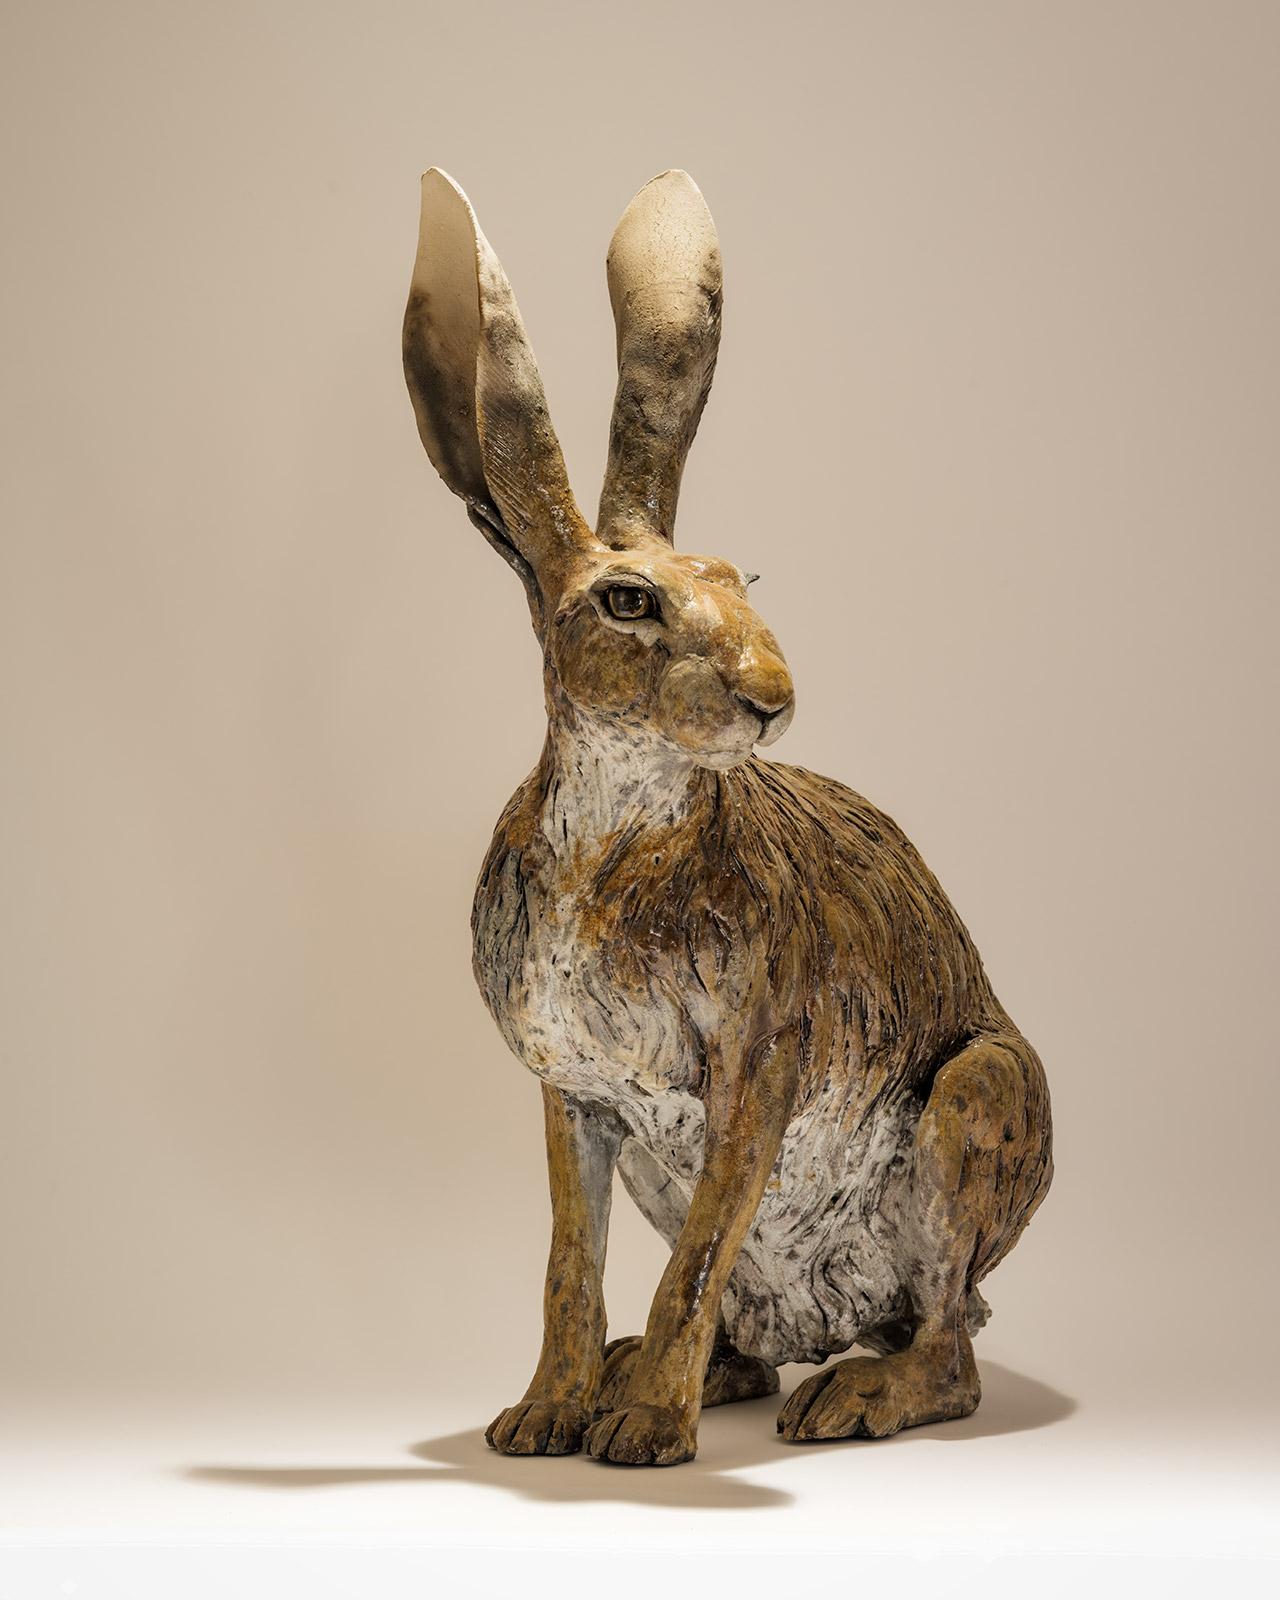 Hare Sculpture